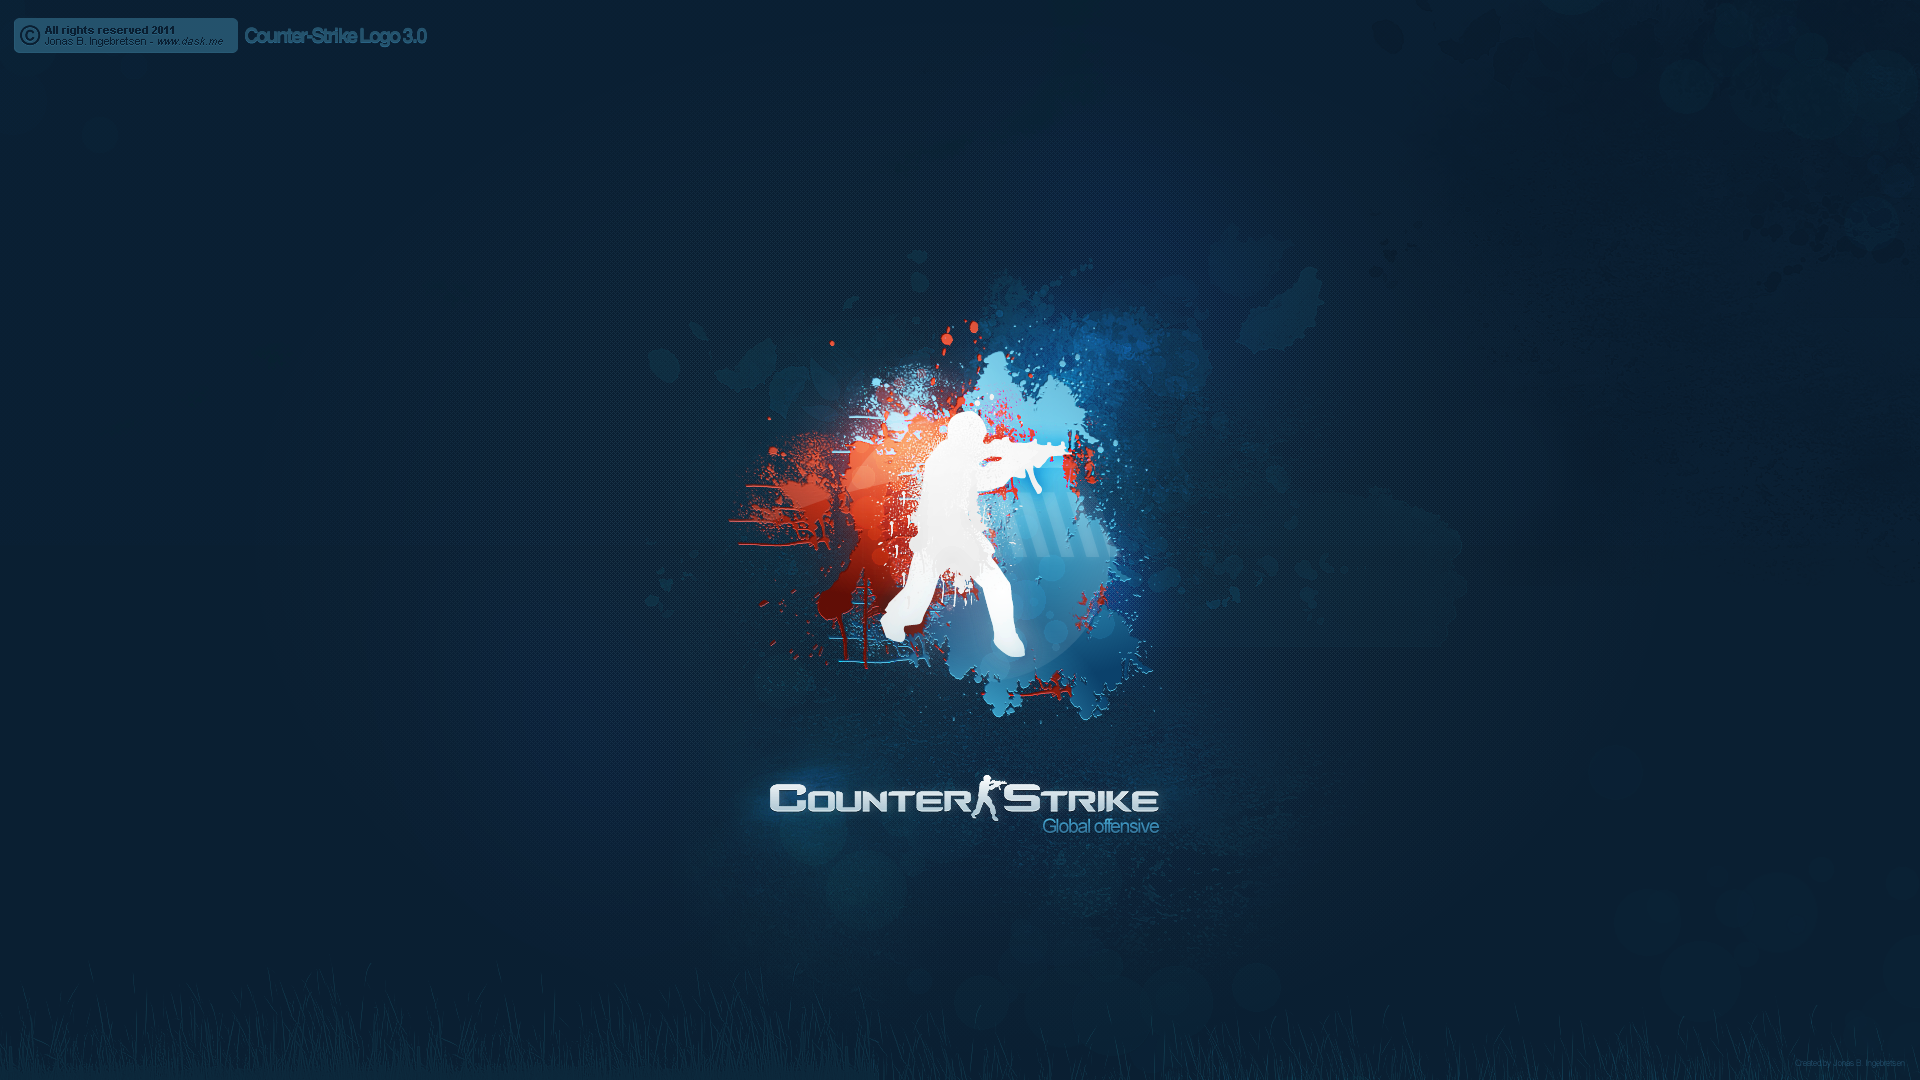 Counter-Strike: Global Offensive Logo 3.0